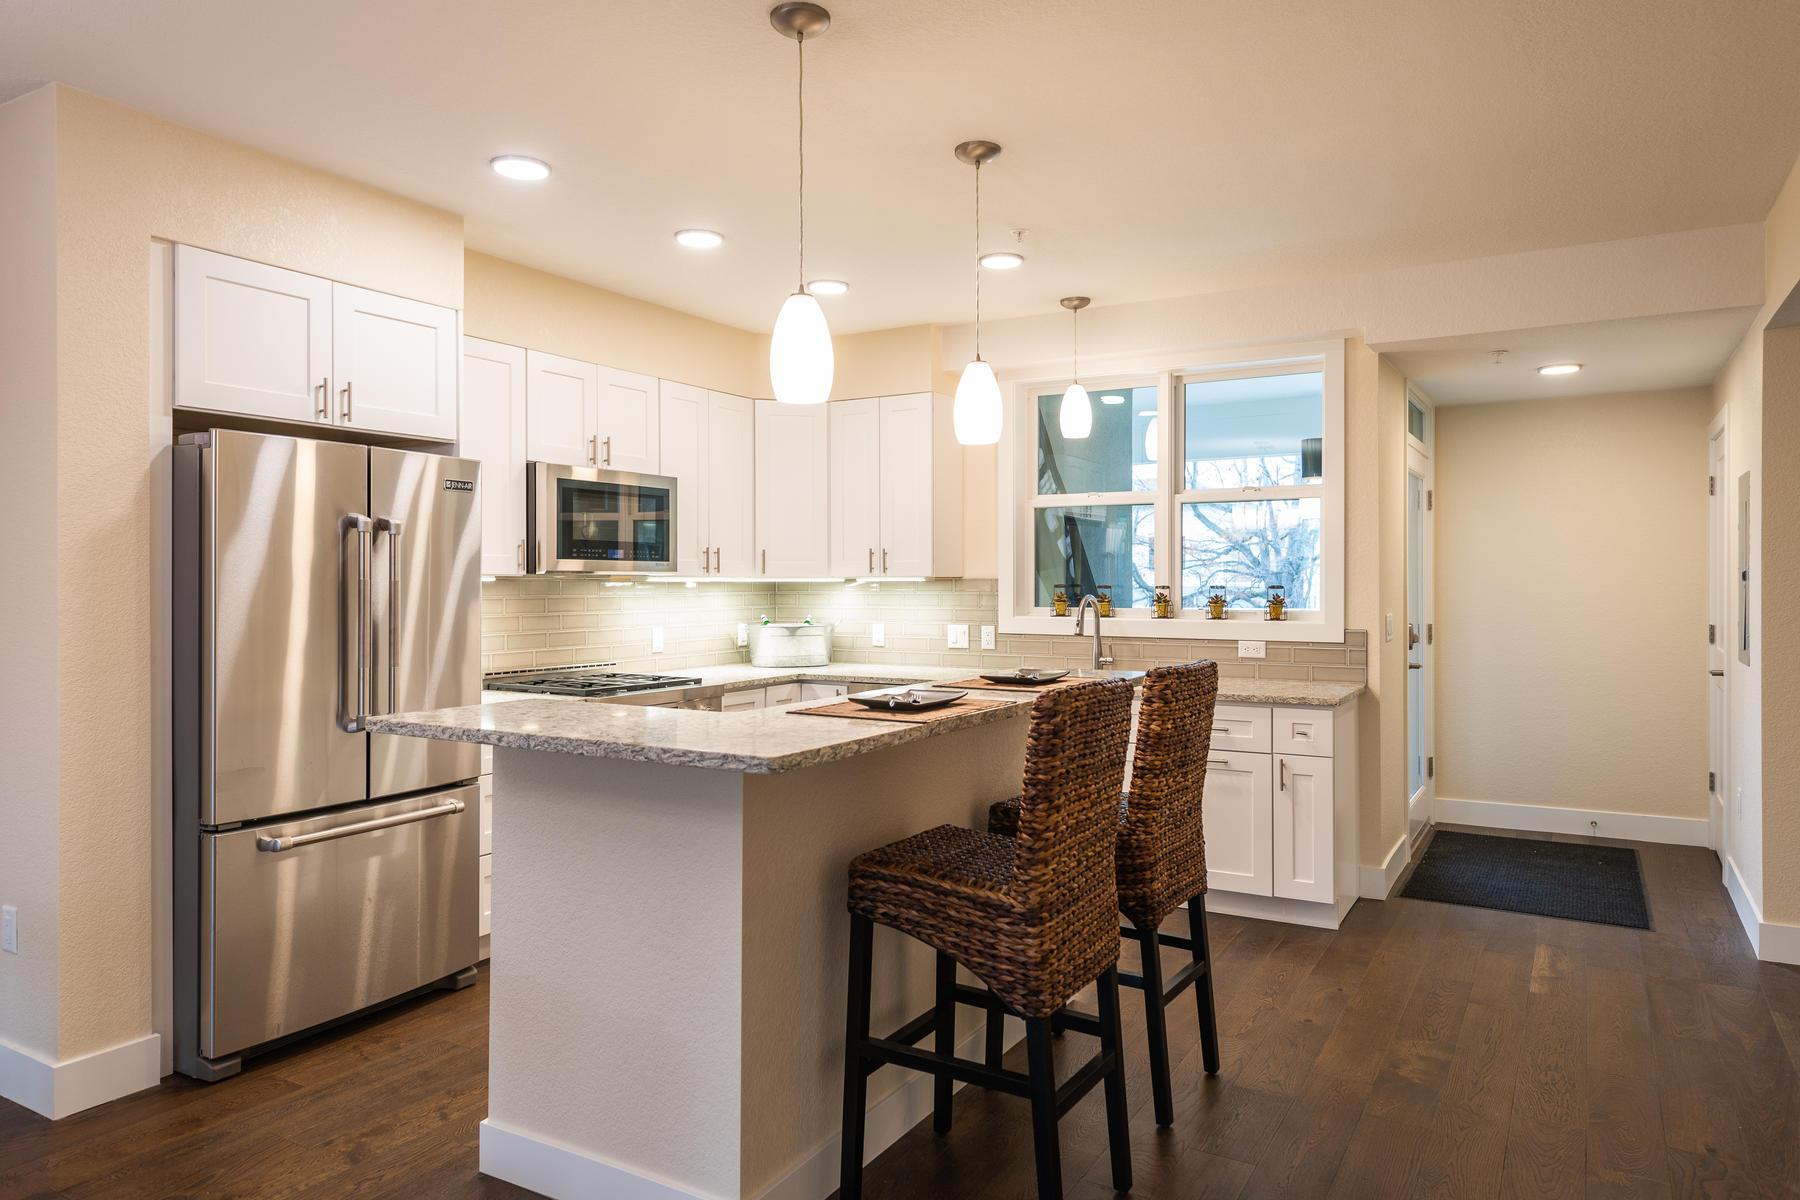 Additional photo for property listing at Washington Village Condo 2930 Broadway St 203 Boulder, Colorado 80304 United States